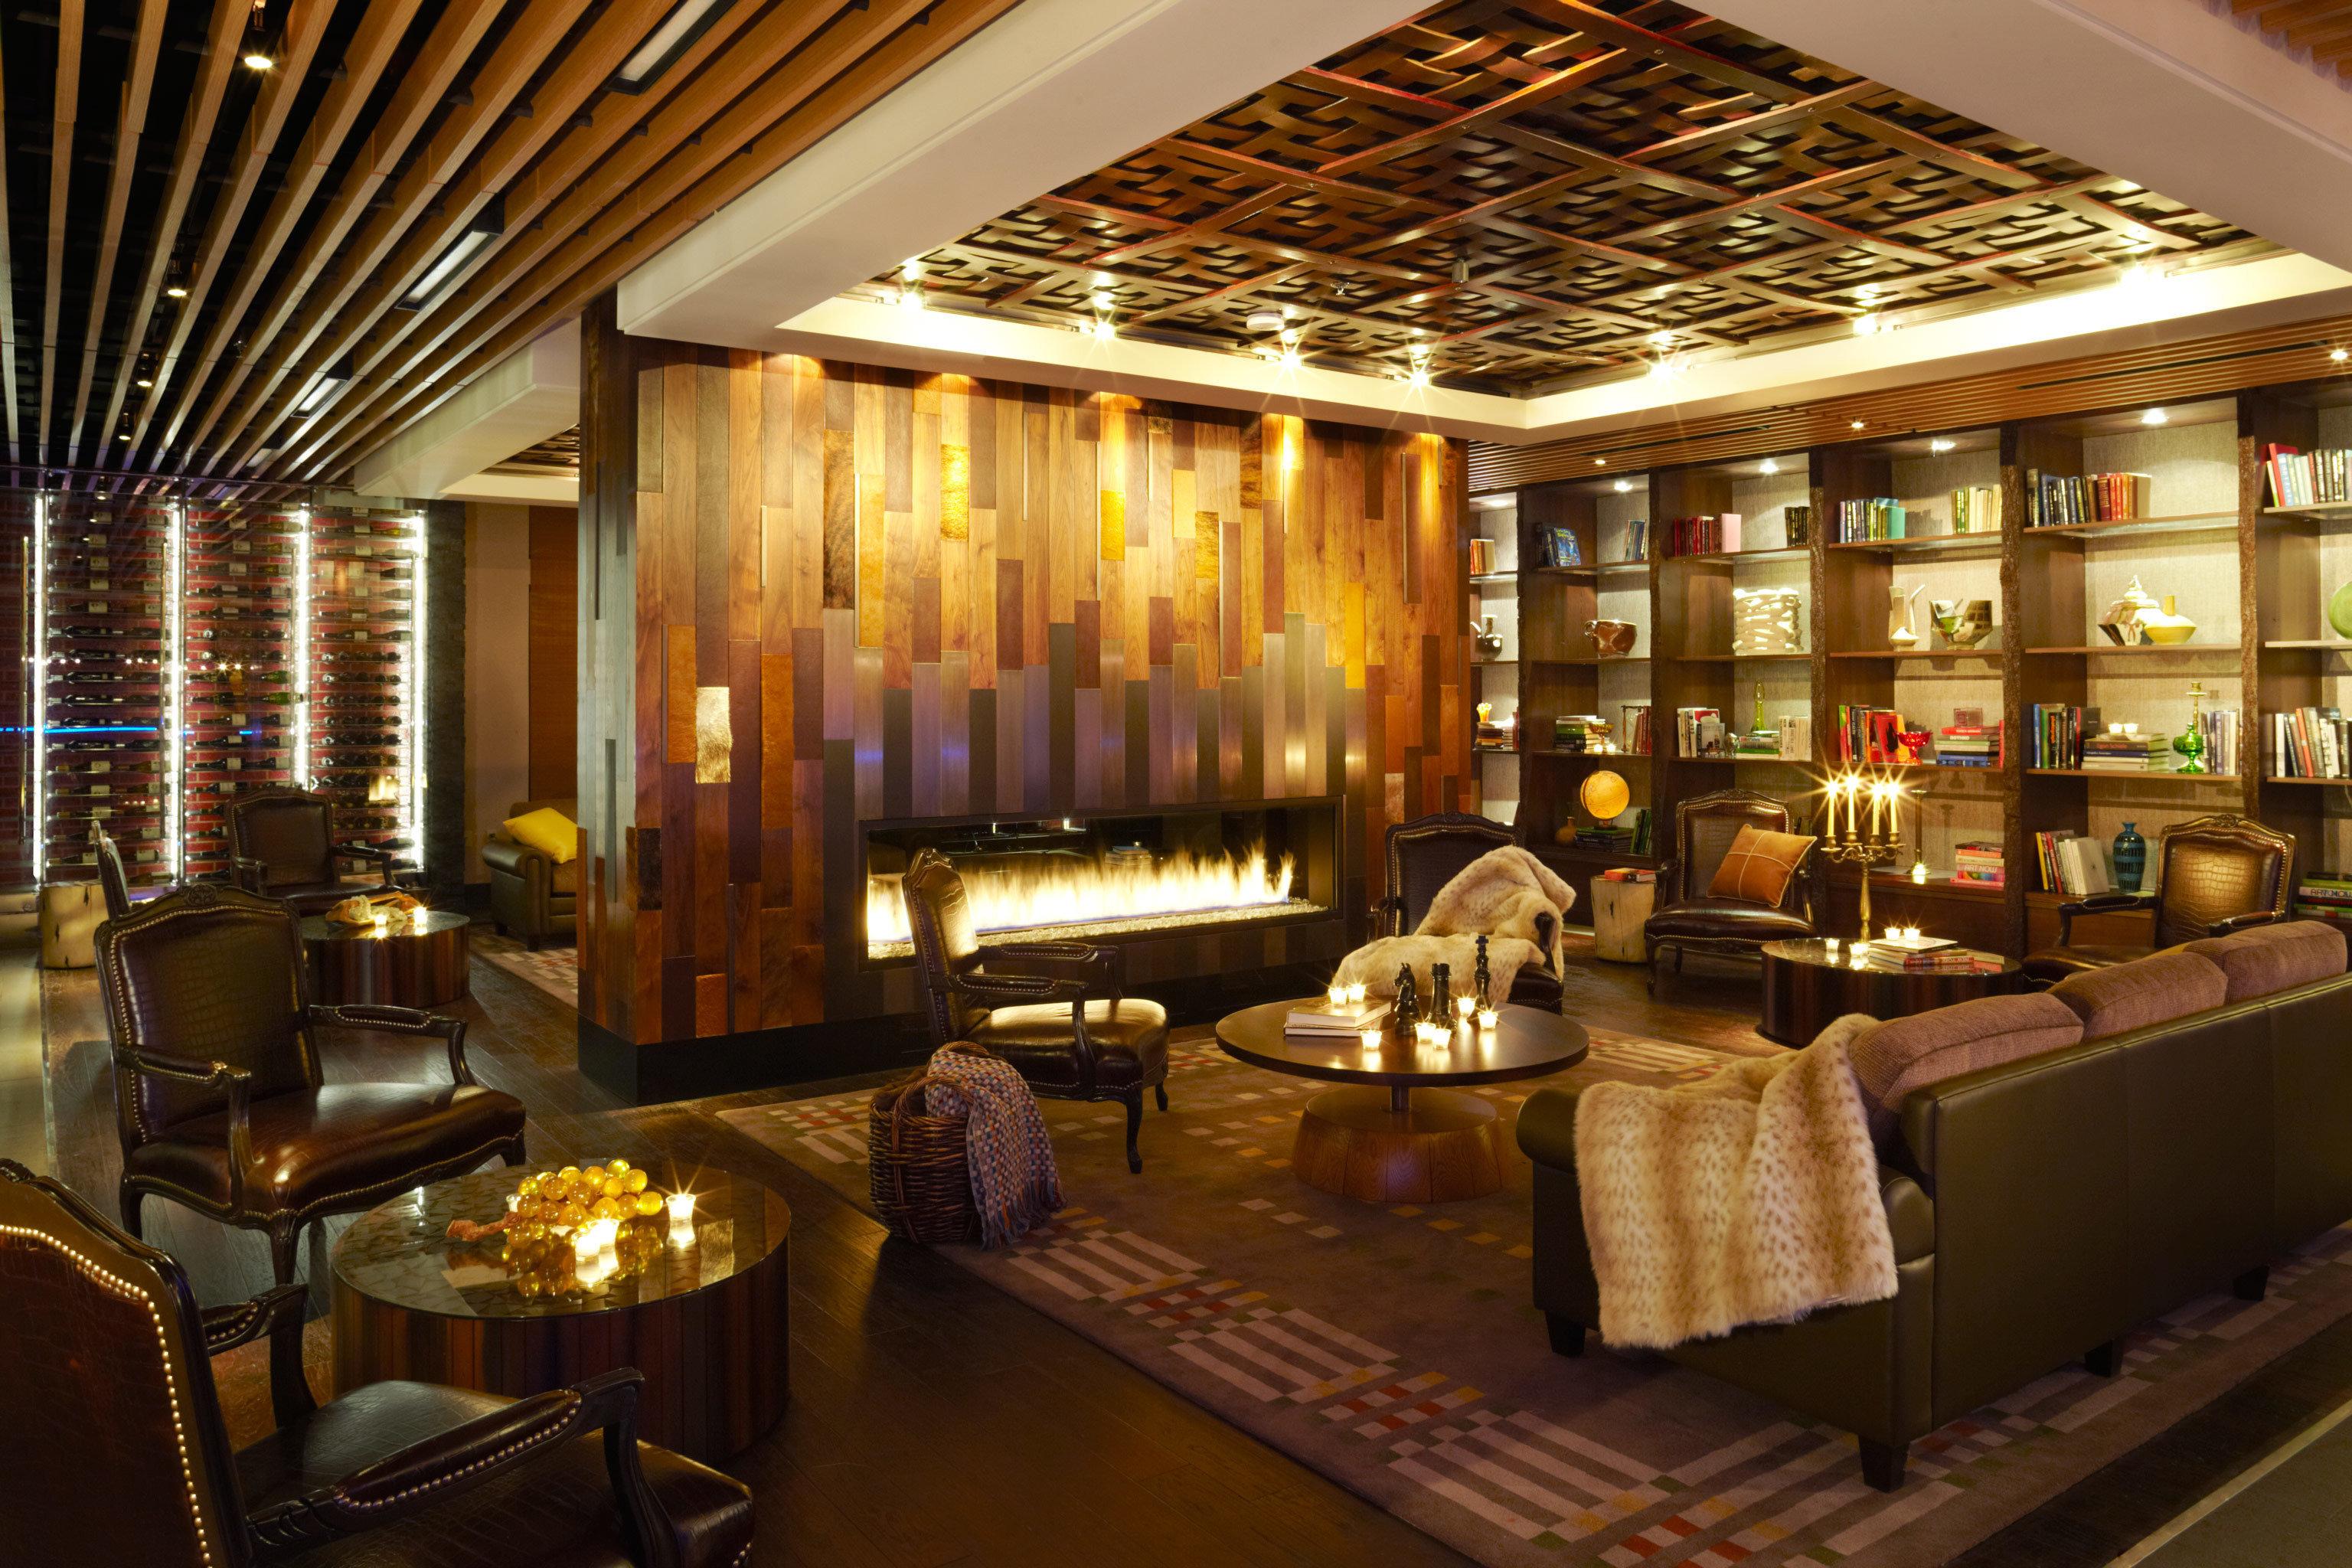 Drink Fireplace Health + Wellness Lounge Luxury Spa Retreats Trip Ideas Lobby Bar restaurant recreation room function hall living room